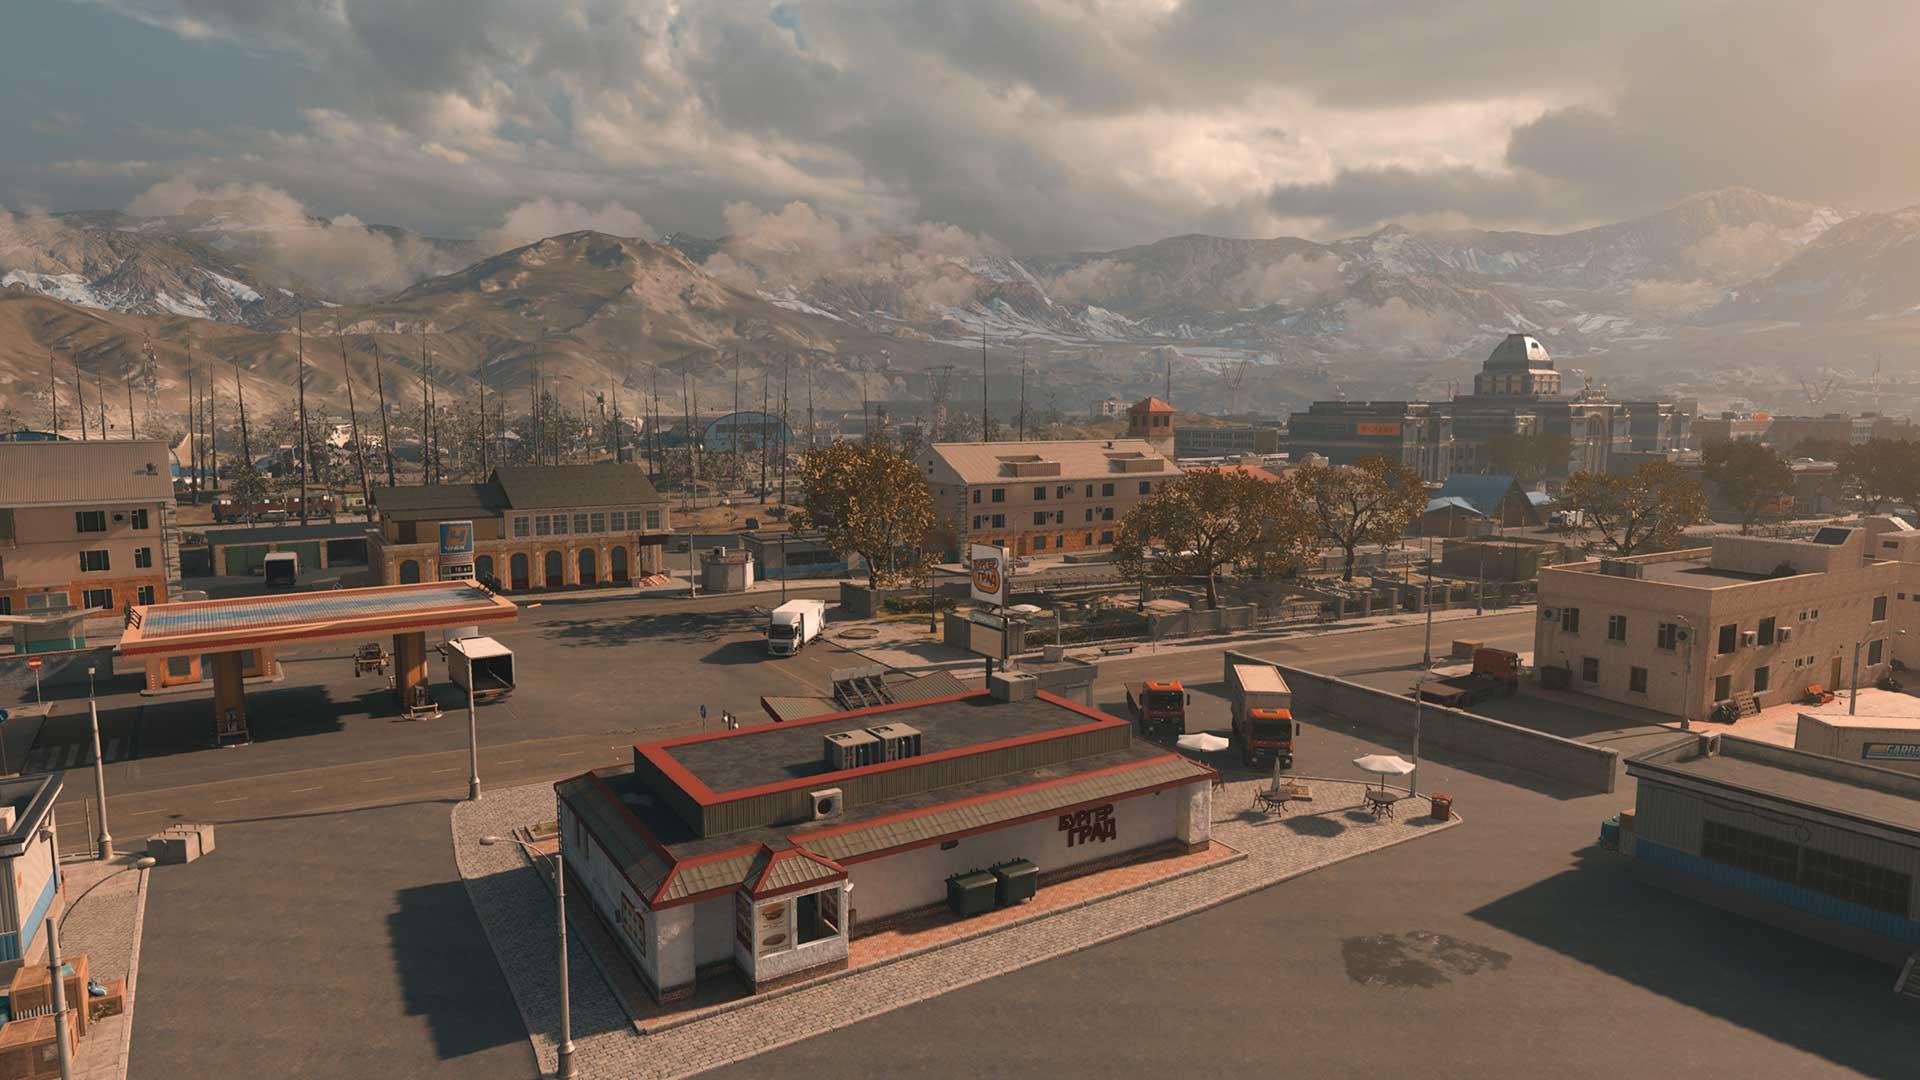 A Complete Neighborhood